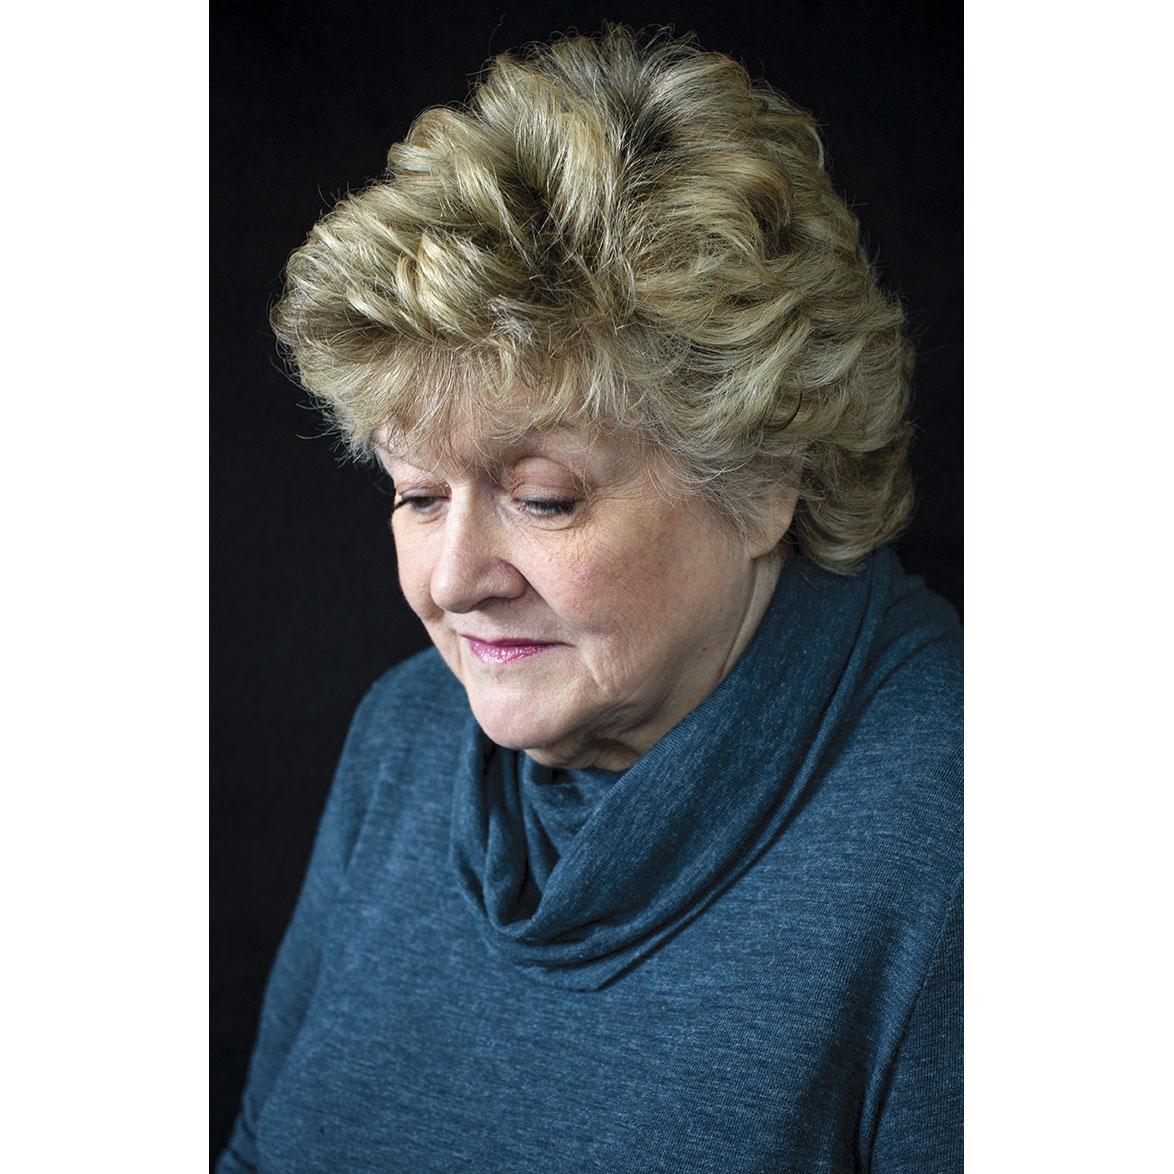 Mary Ann Edwards, New Jersey Portrait by Lori Pedrick